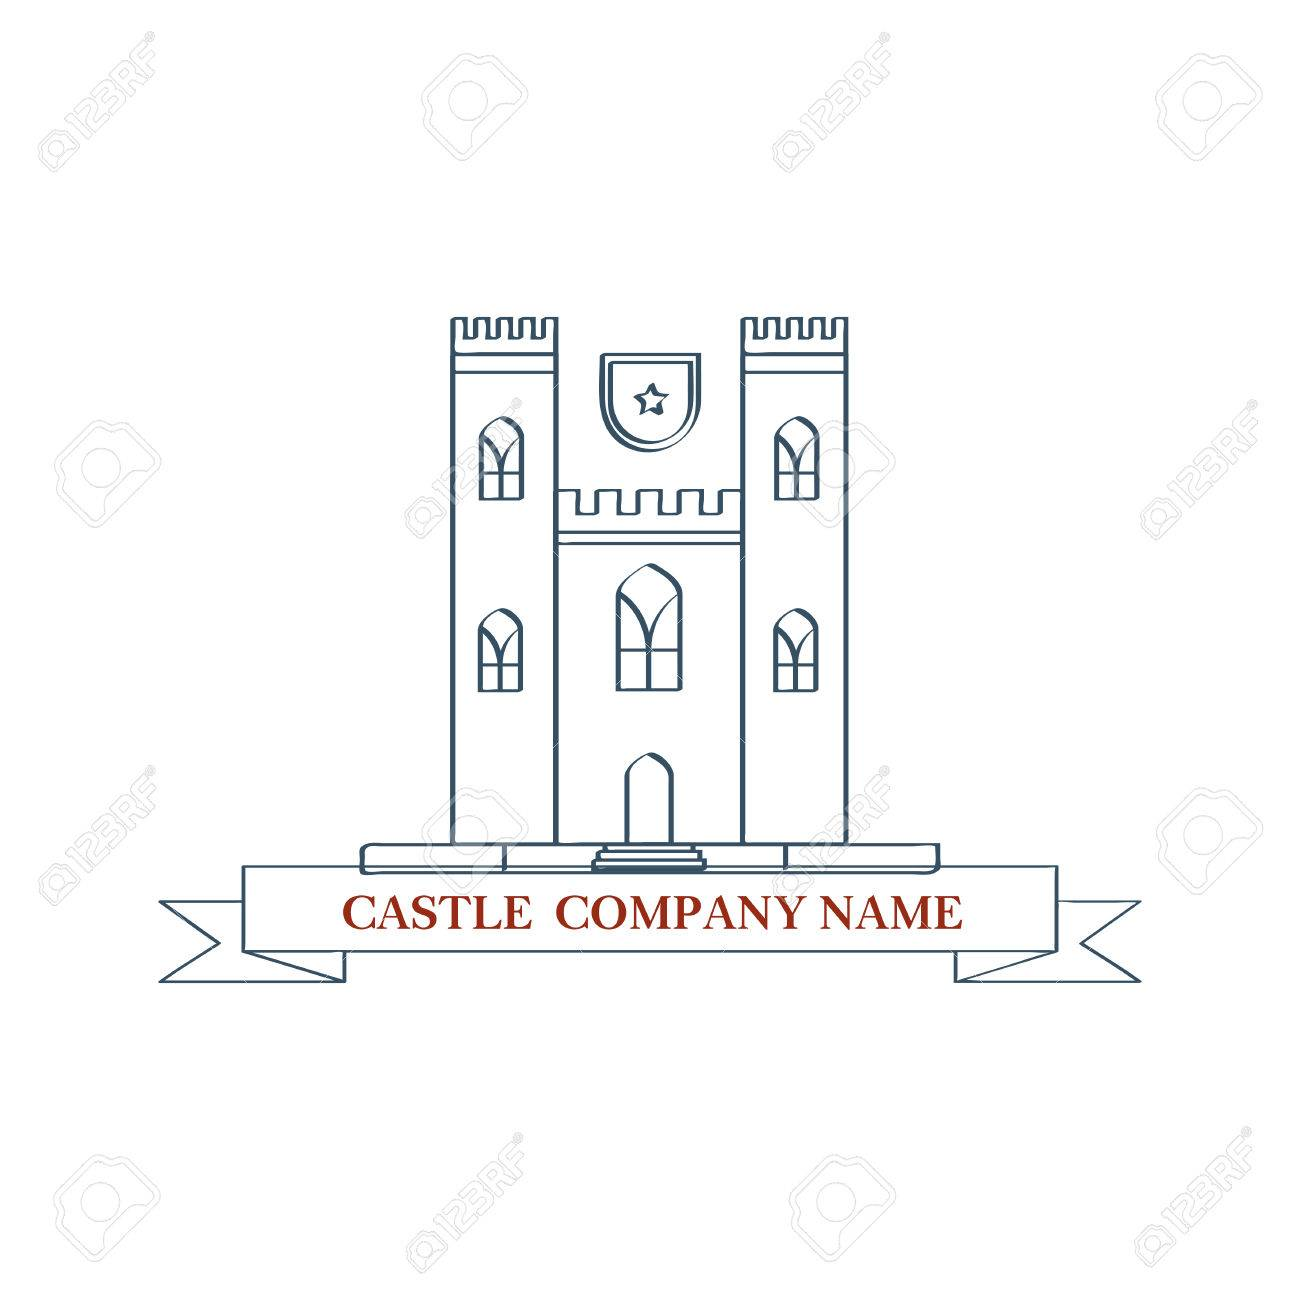 Perfect Logo For Luxury Travel Agency. Isolated Illustration On White  Background